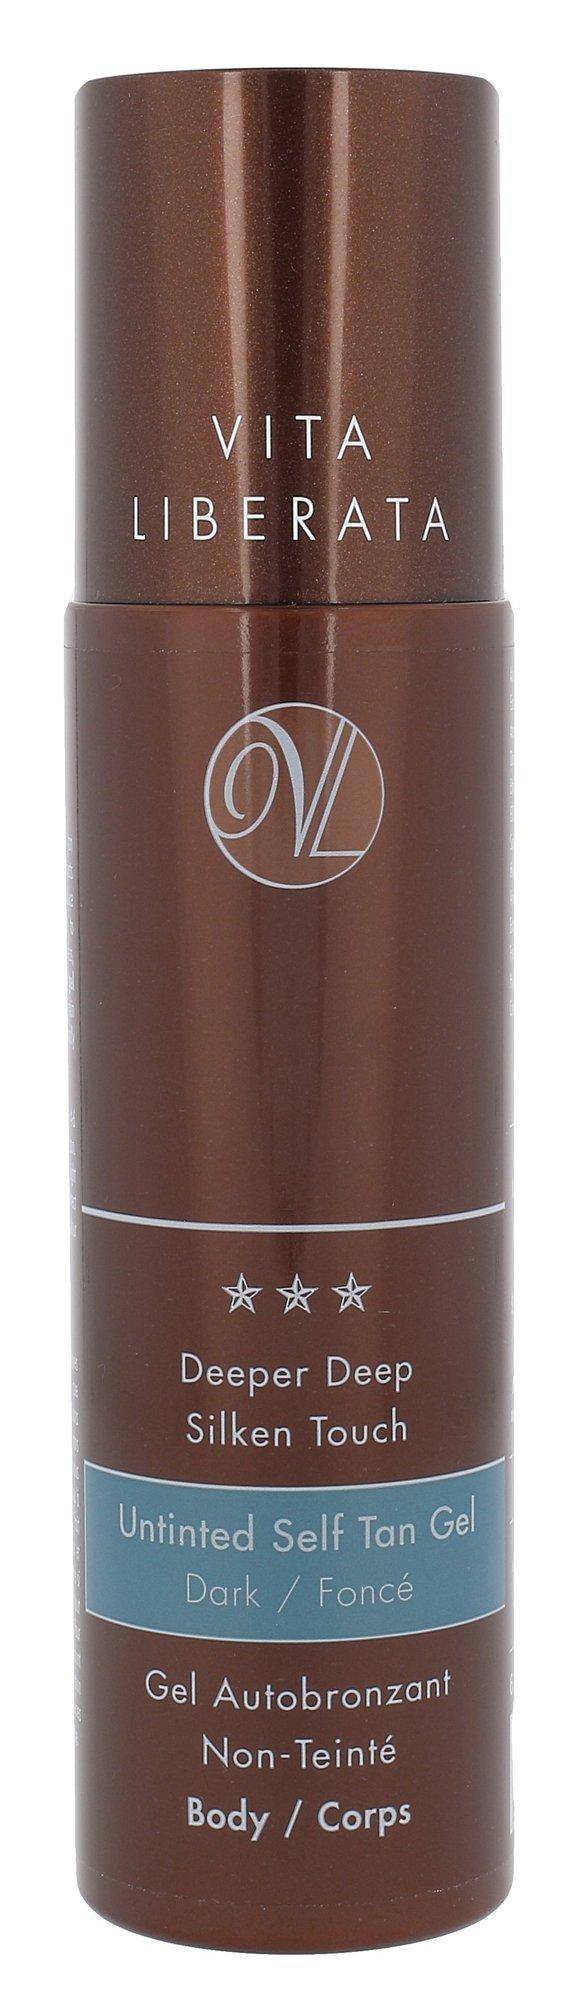 Vita Liberata Untinted Self Tan Gel Cosmetic 200ml Dark